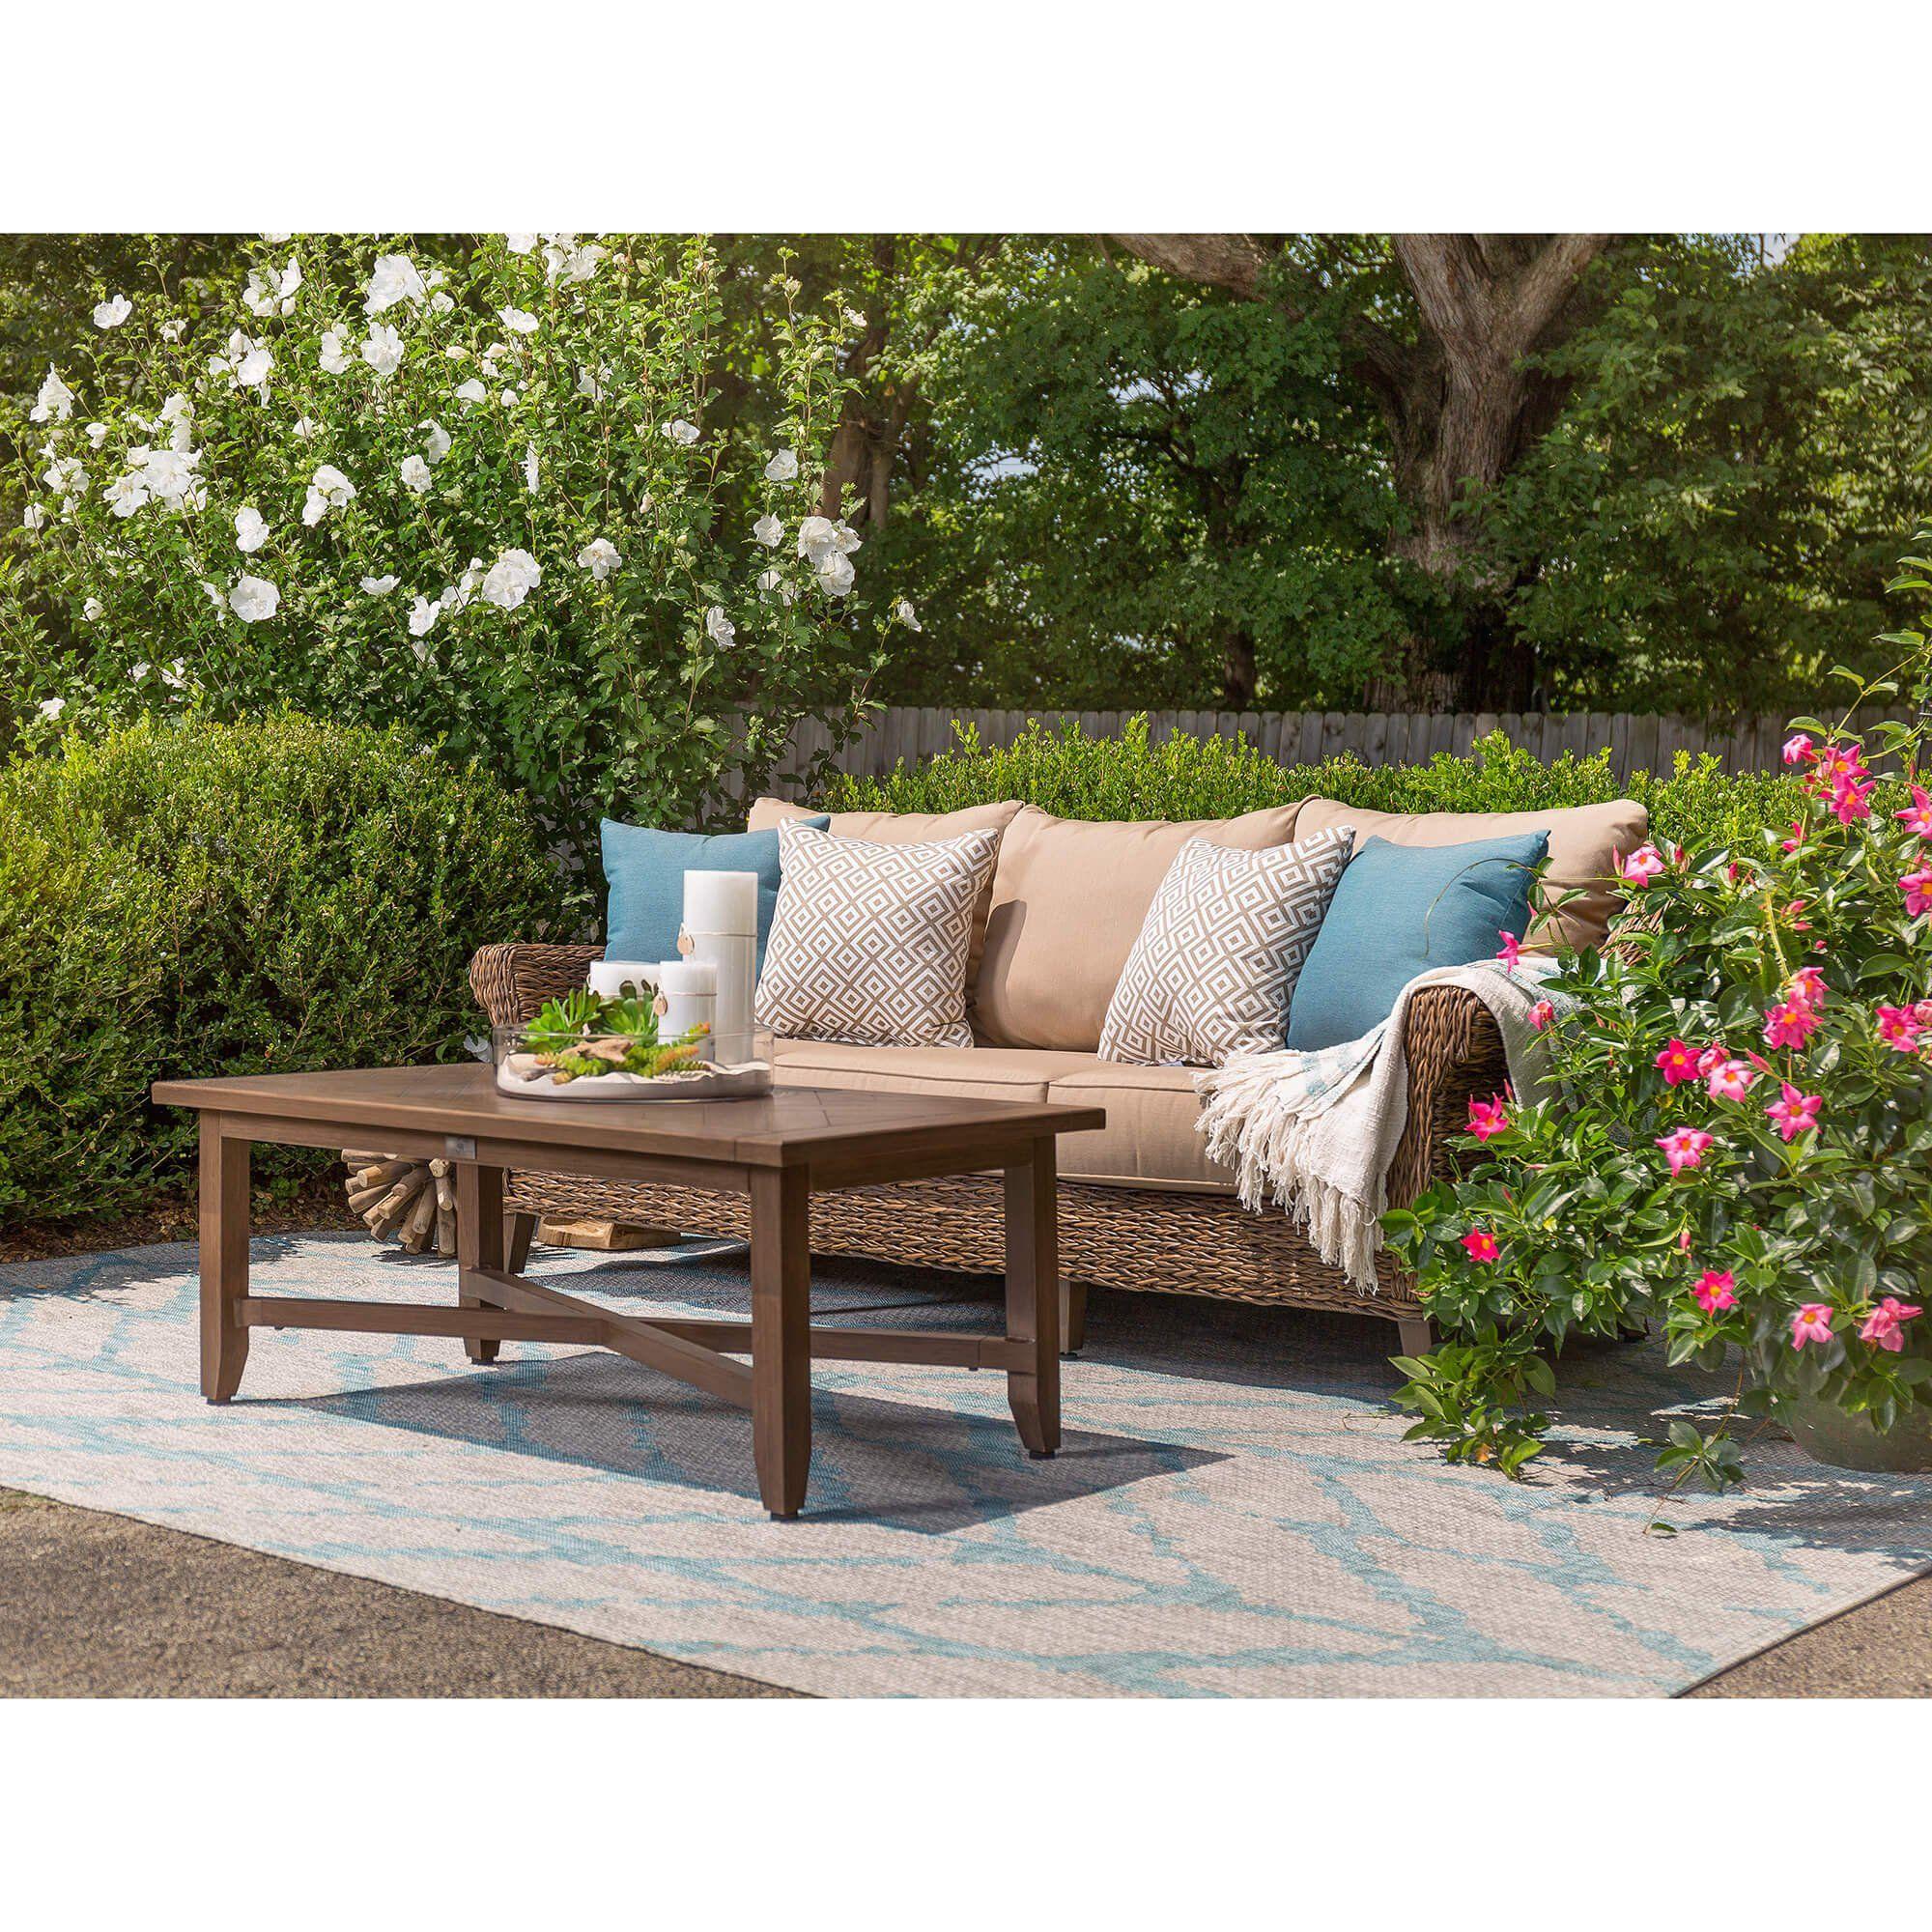 Blue Oak Outdoor Bahamas Patio Furniture Sofa With Sunbrella